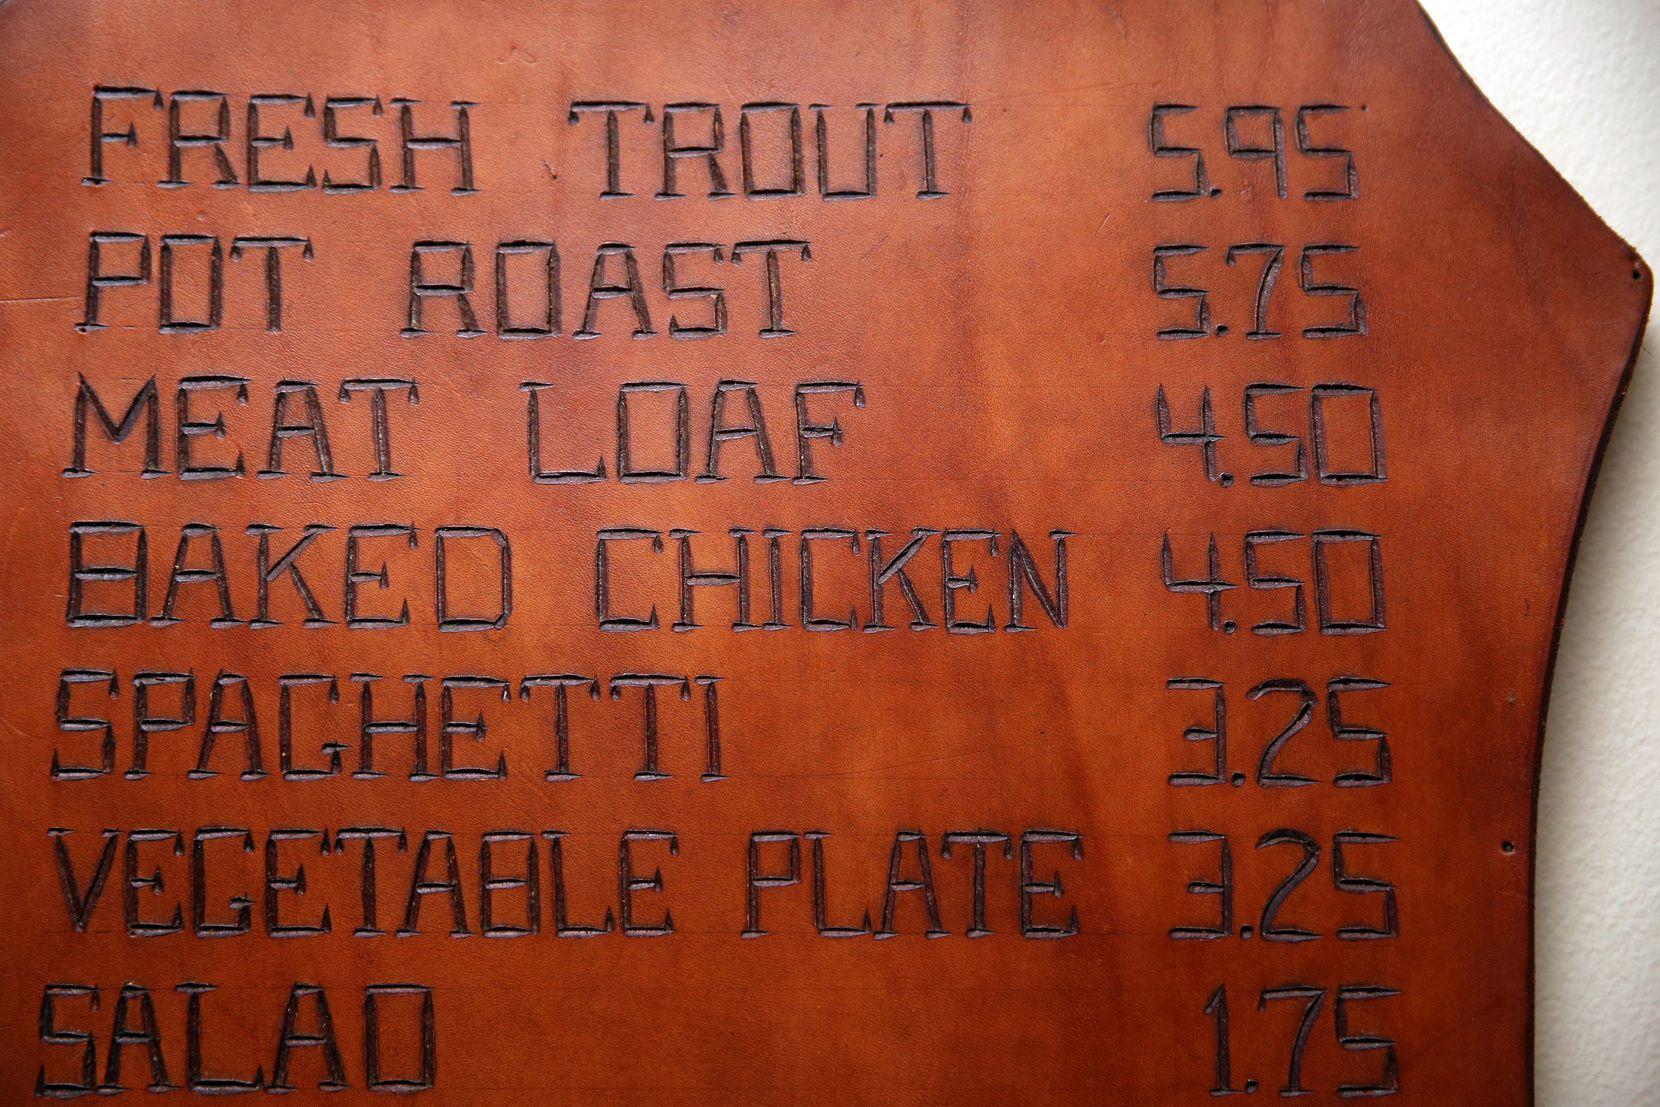 Celebration's original menus were made of leather.